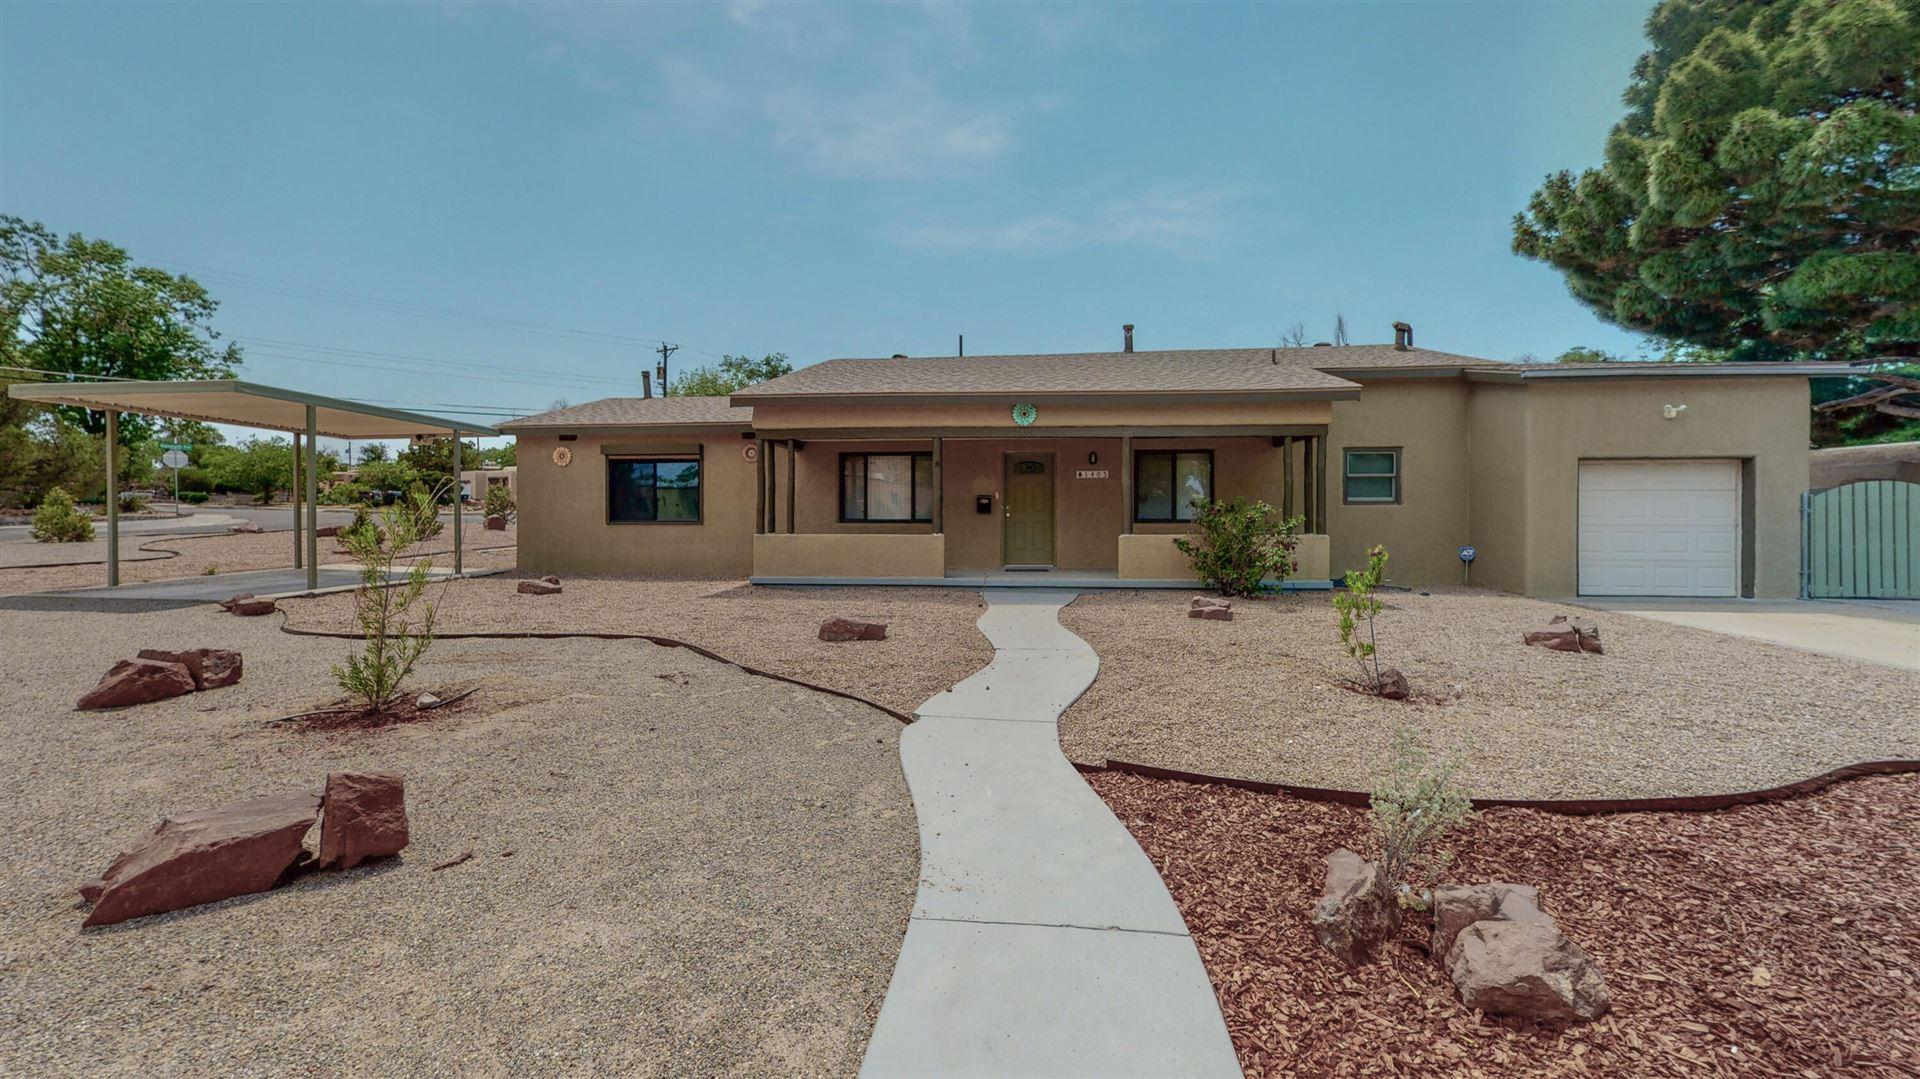 Photo of 1405 PRINCETON Drive NE, Albuquerque, NM 87106 (MLS # 994843)